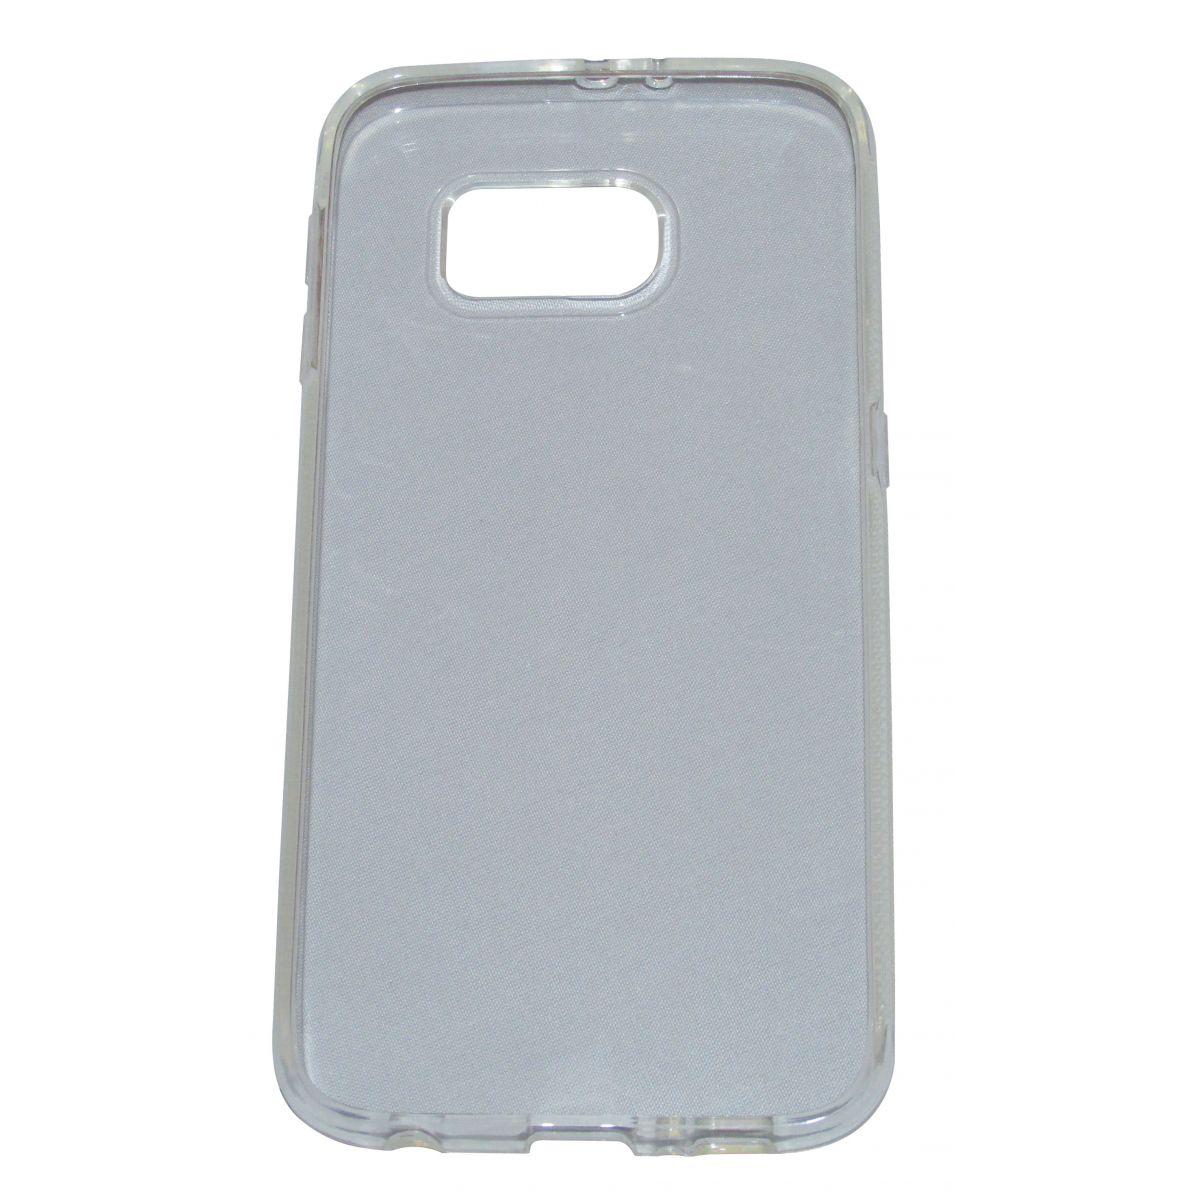 Capa TPU Transparente Samsung Galaxy S6 Edge G925